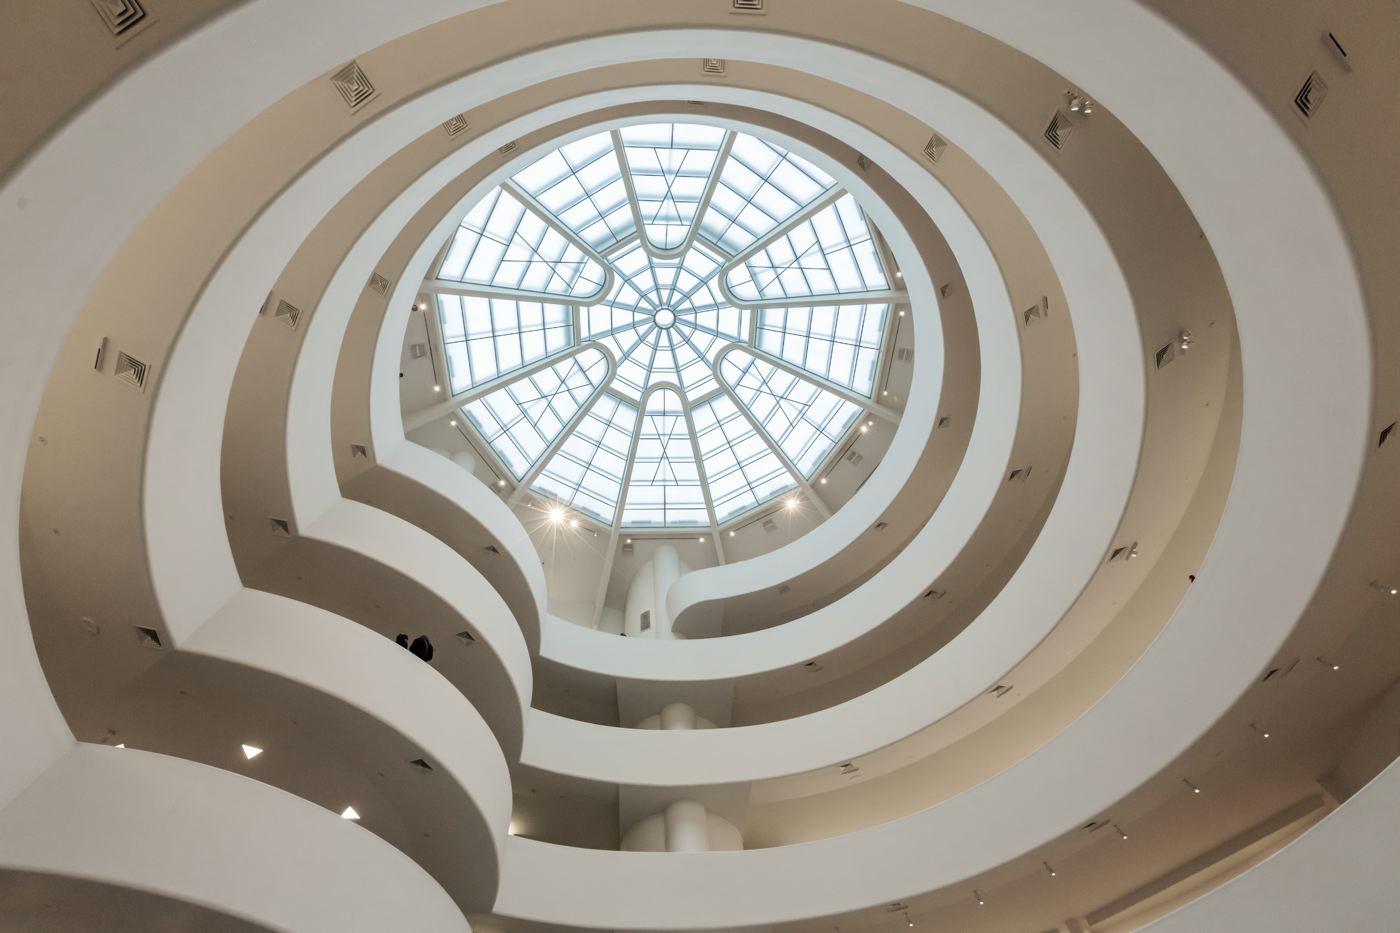 LDKphoto_Guggenheim-New-York-005.jpg